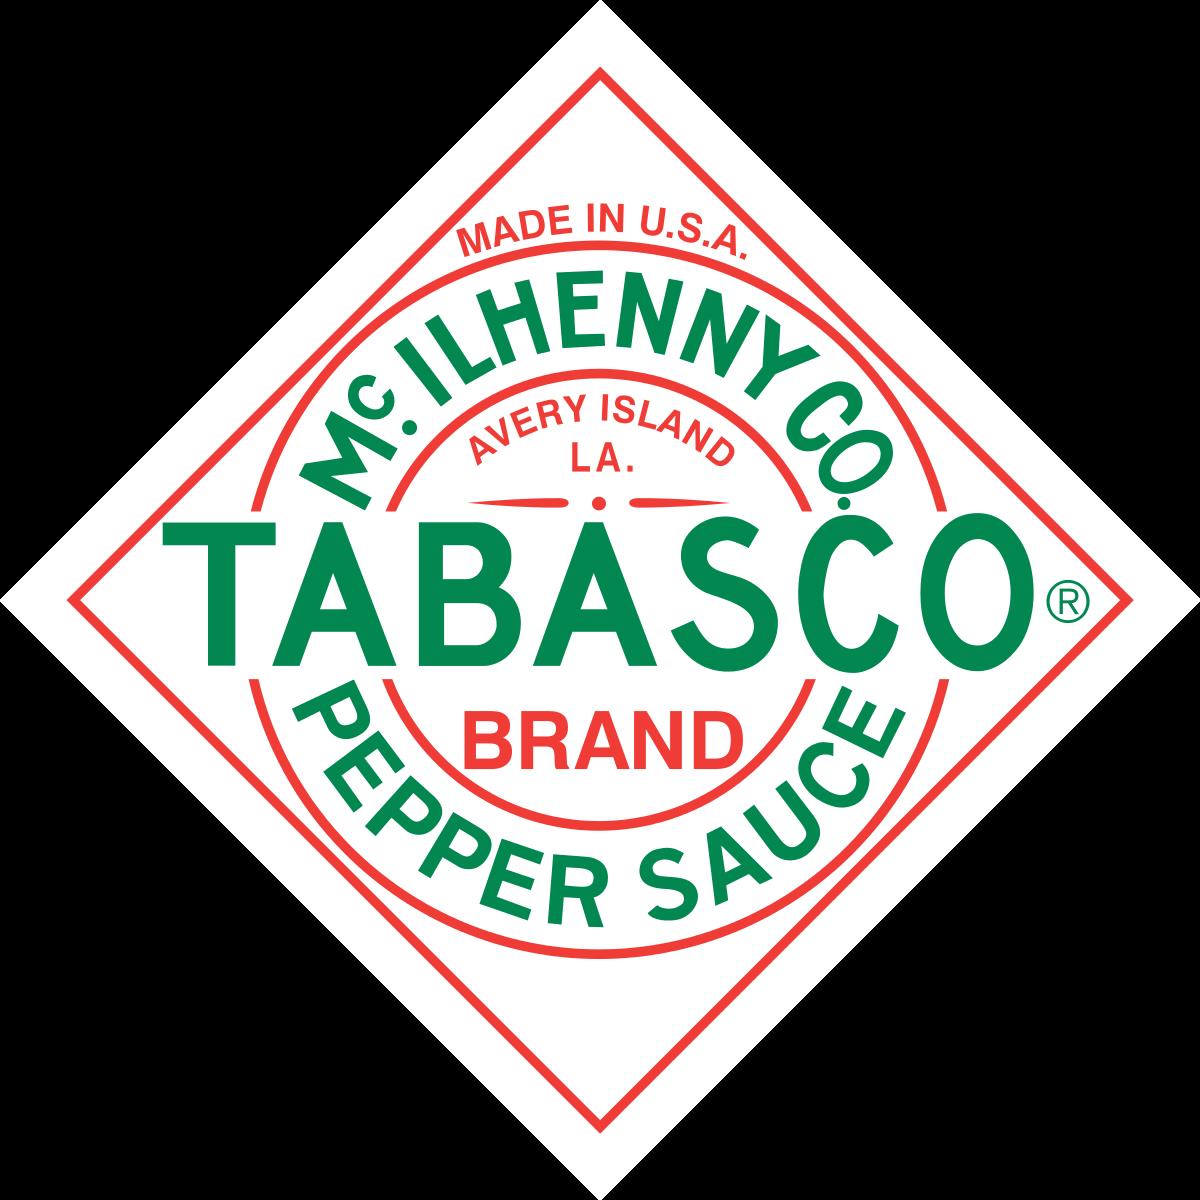 Tabasco sauce.